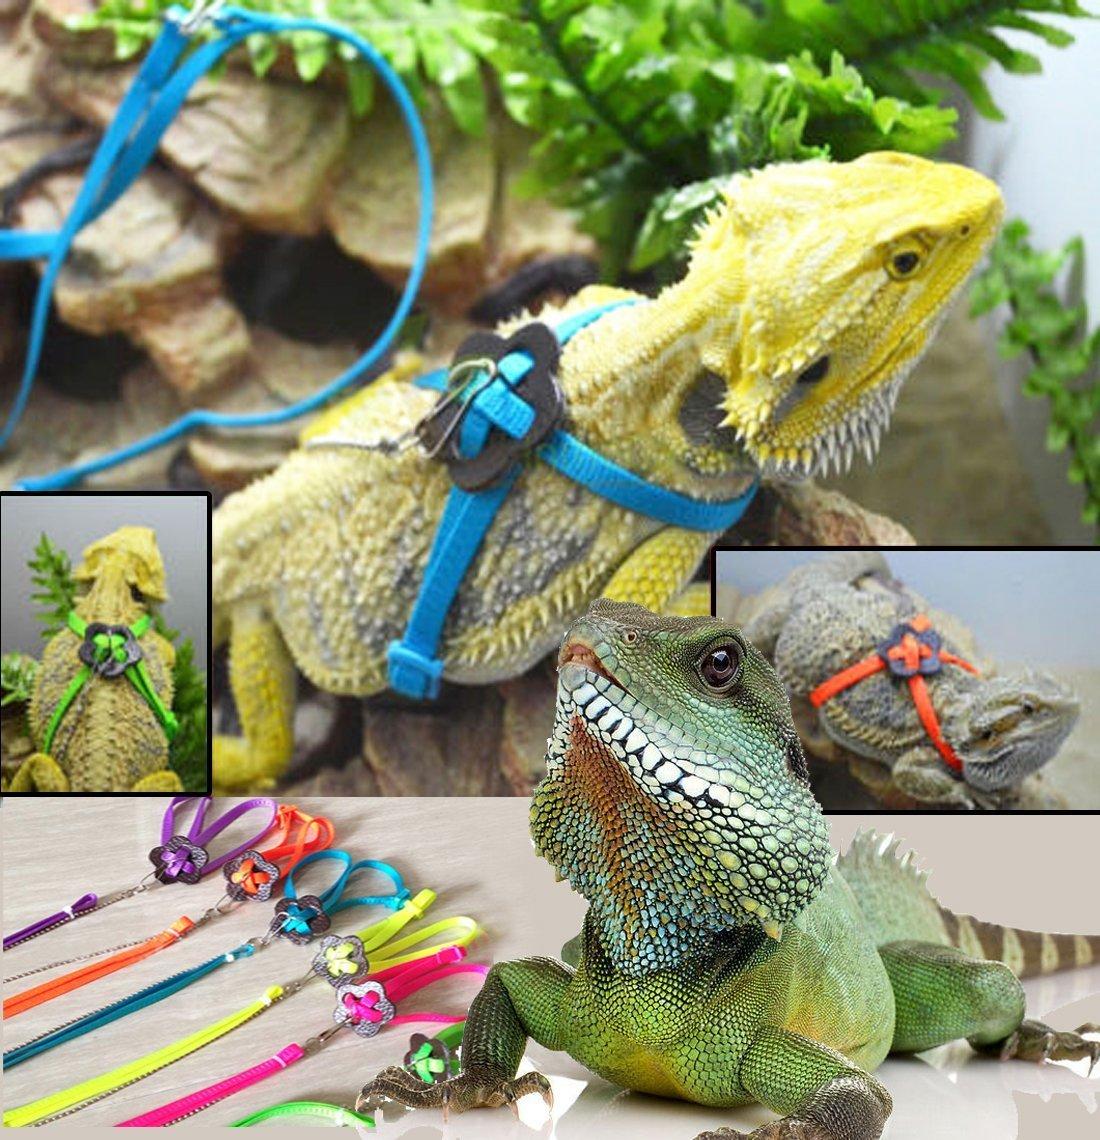 Yonger Adjustable Pet Small Animal Reptile Lizard Harness Nylon Lead Leash Rope Soft (Green)